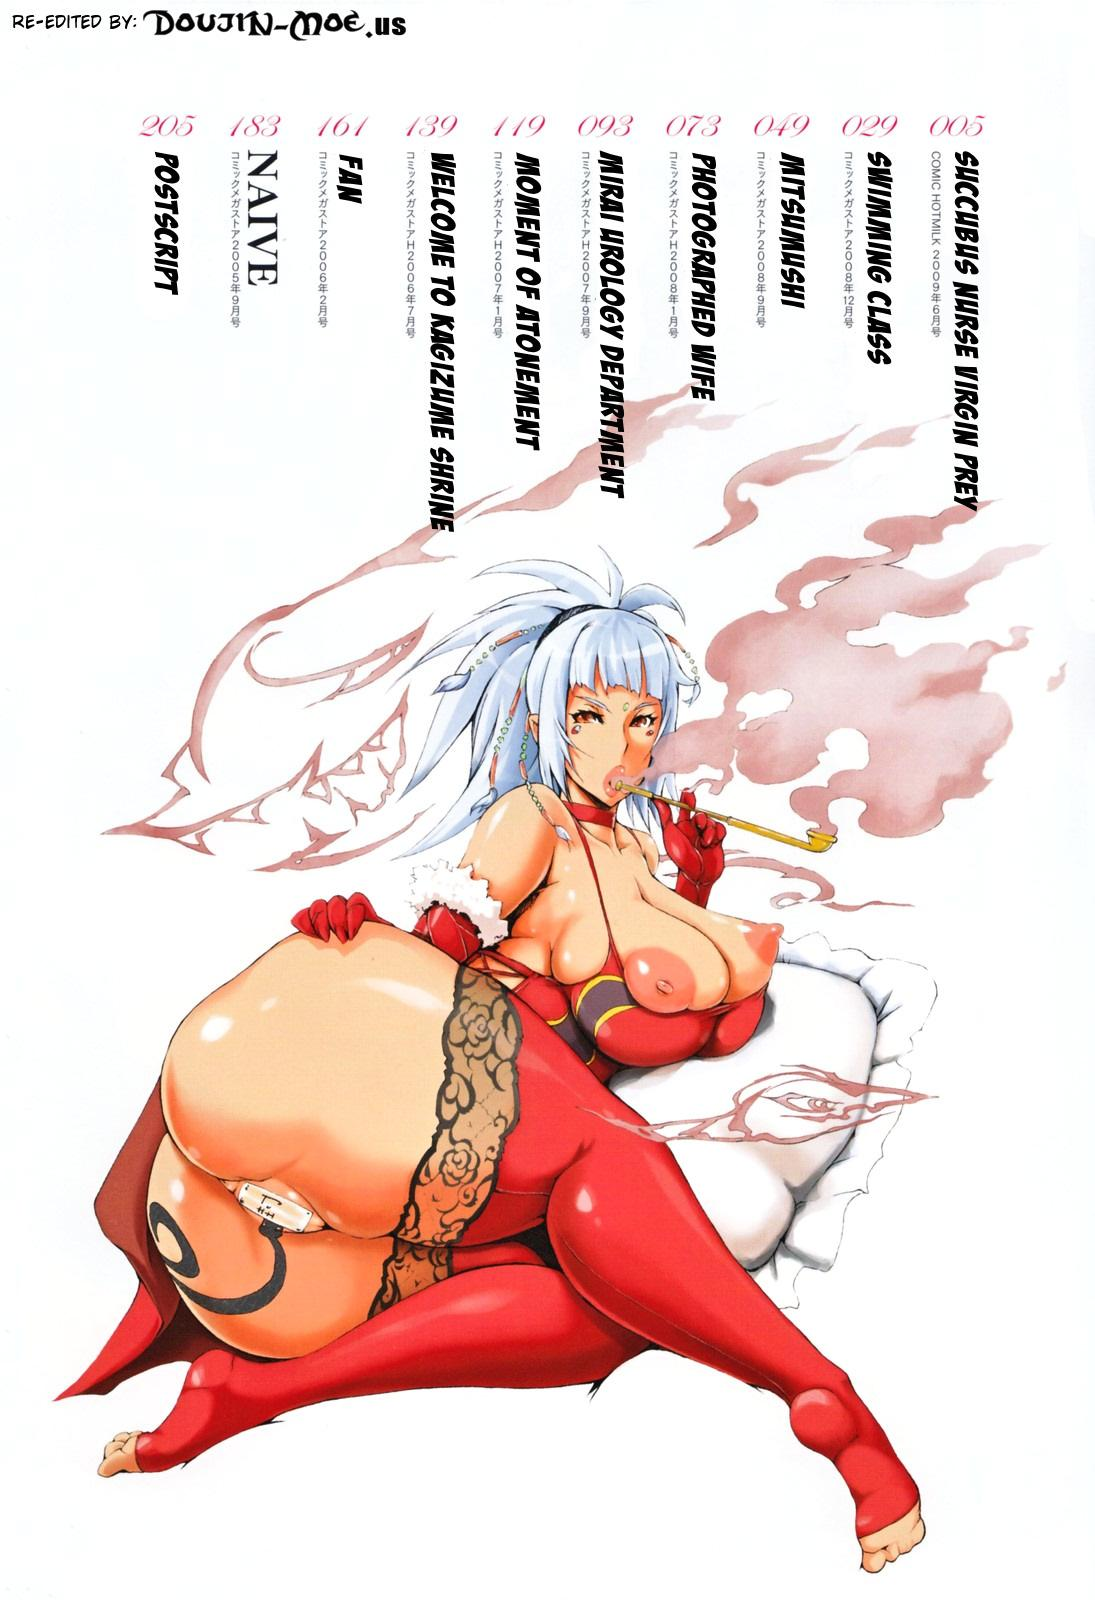 Chijo de Yajuu - Bitch with the Beast 7